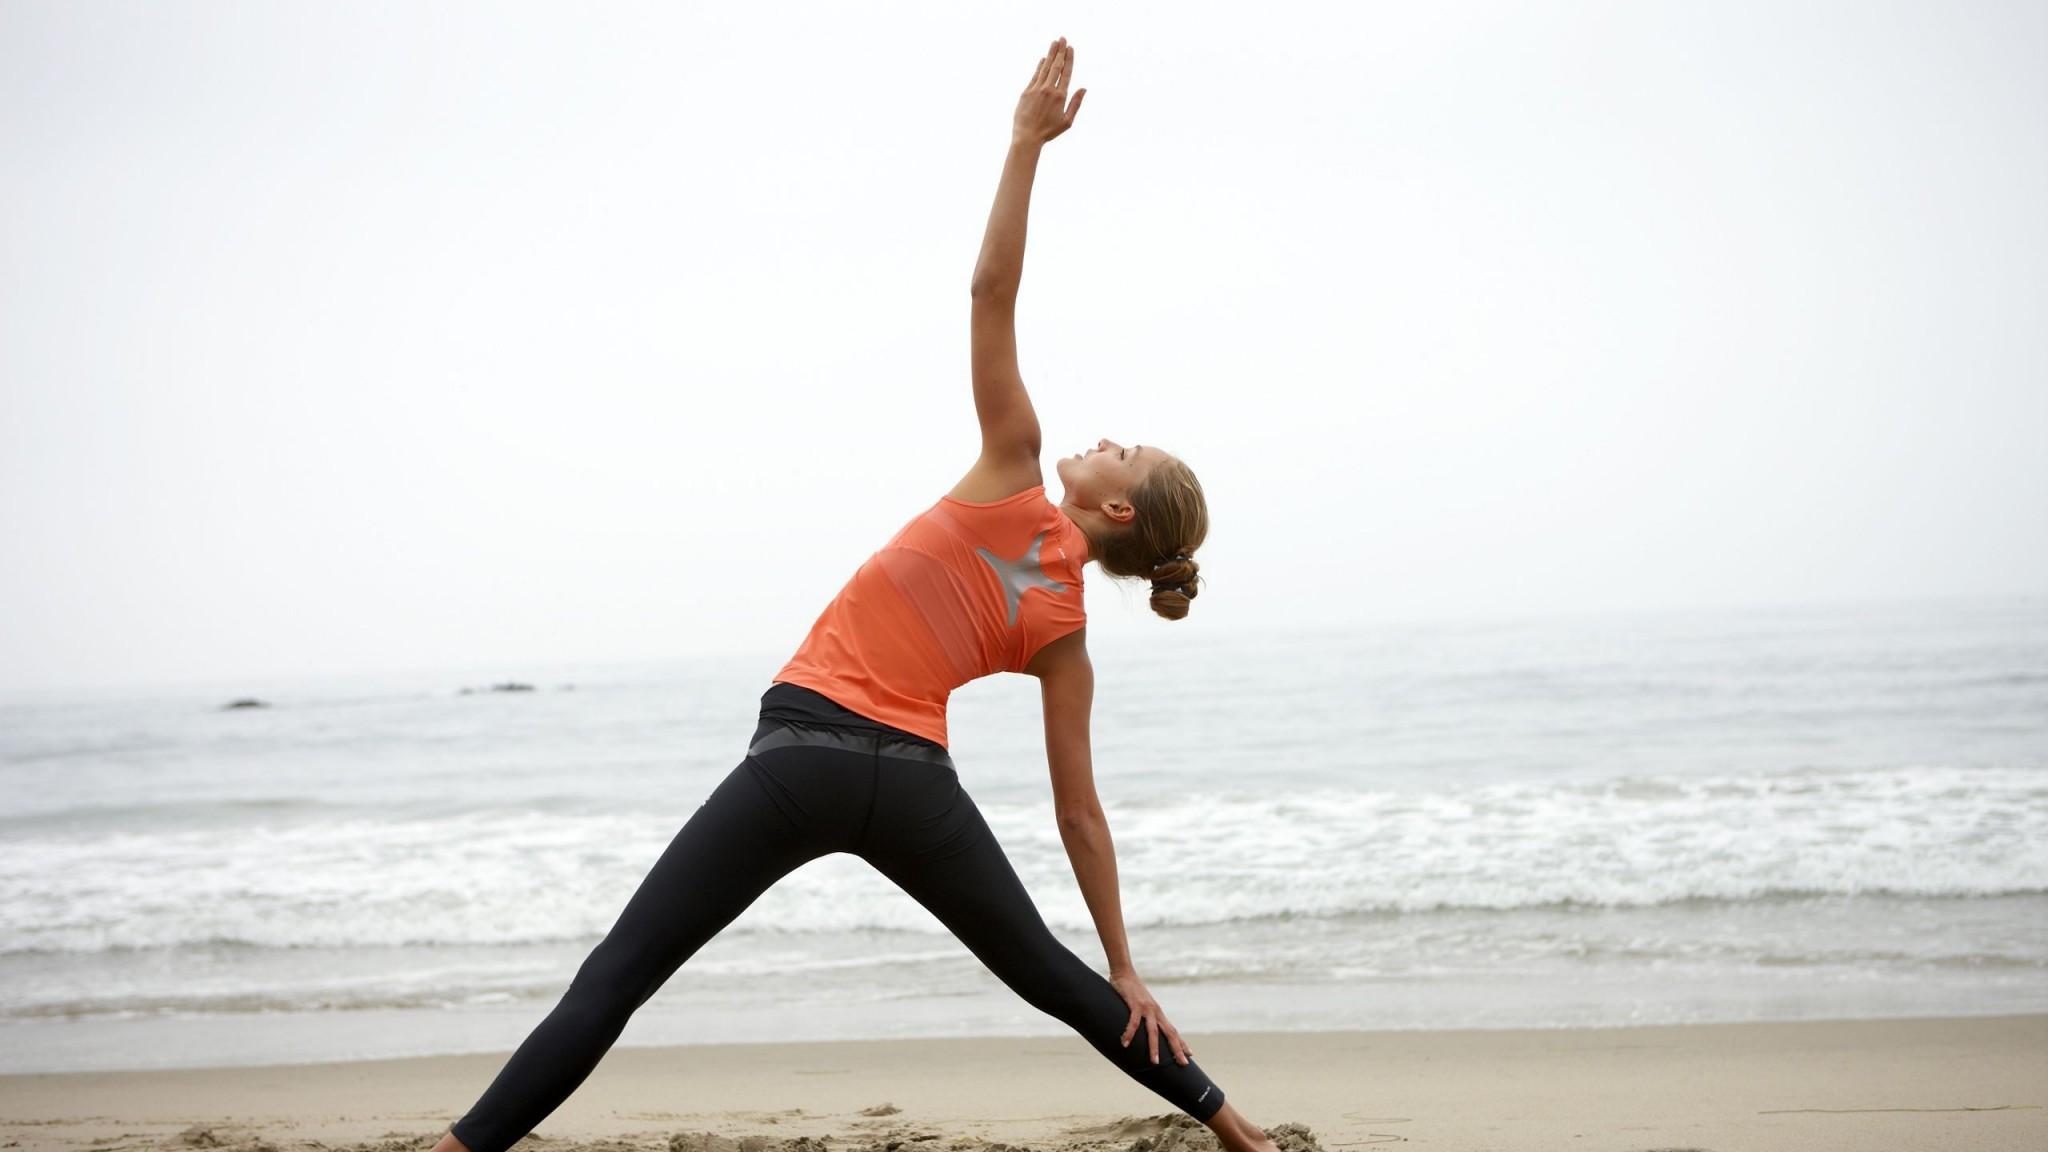 Фото девушки фитнес на пляже 5 фотография